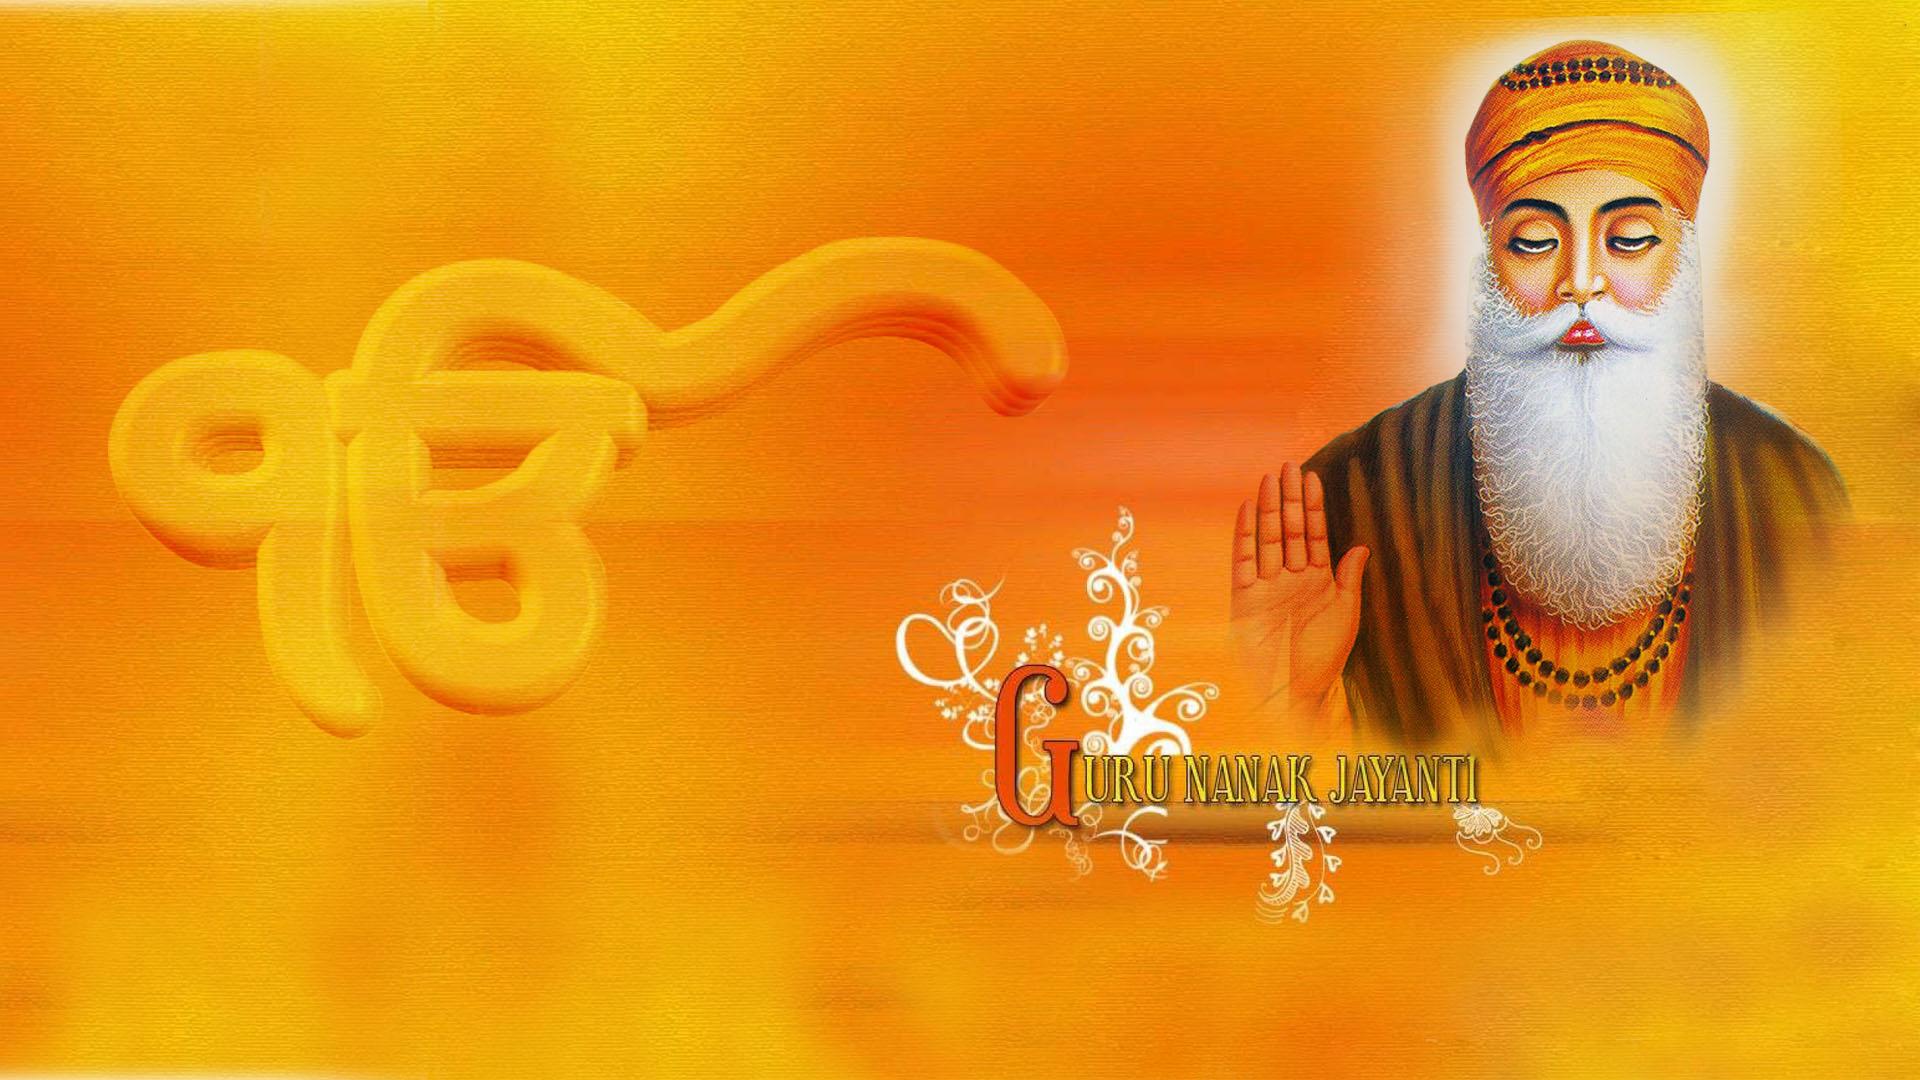 Guru Nanak Jayanti Wallpaper Hd